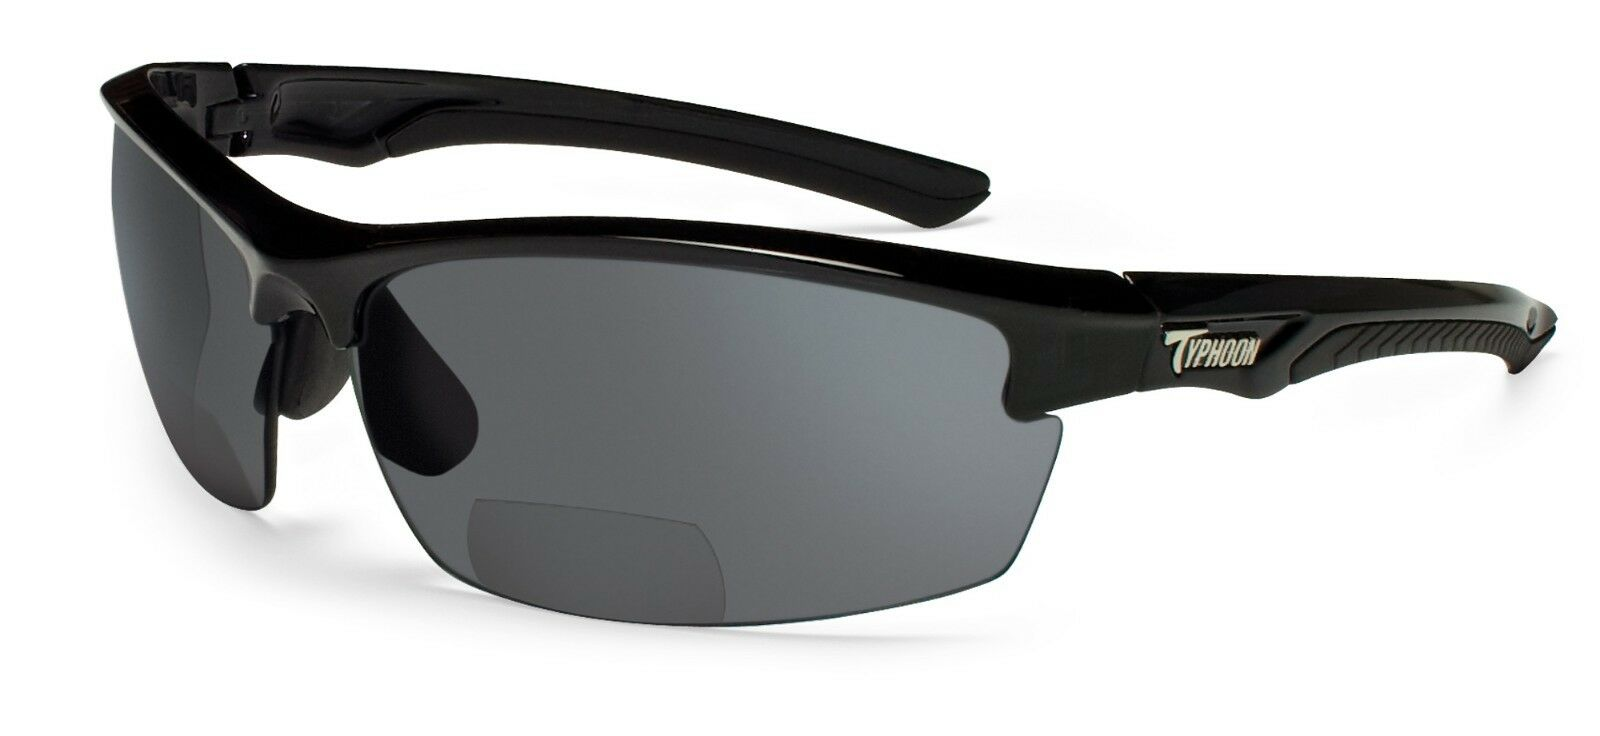 c09455f8af Typhoon Optics Mariner II Bifocal Sunglasses 948tbk 2.5 Black ...